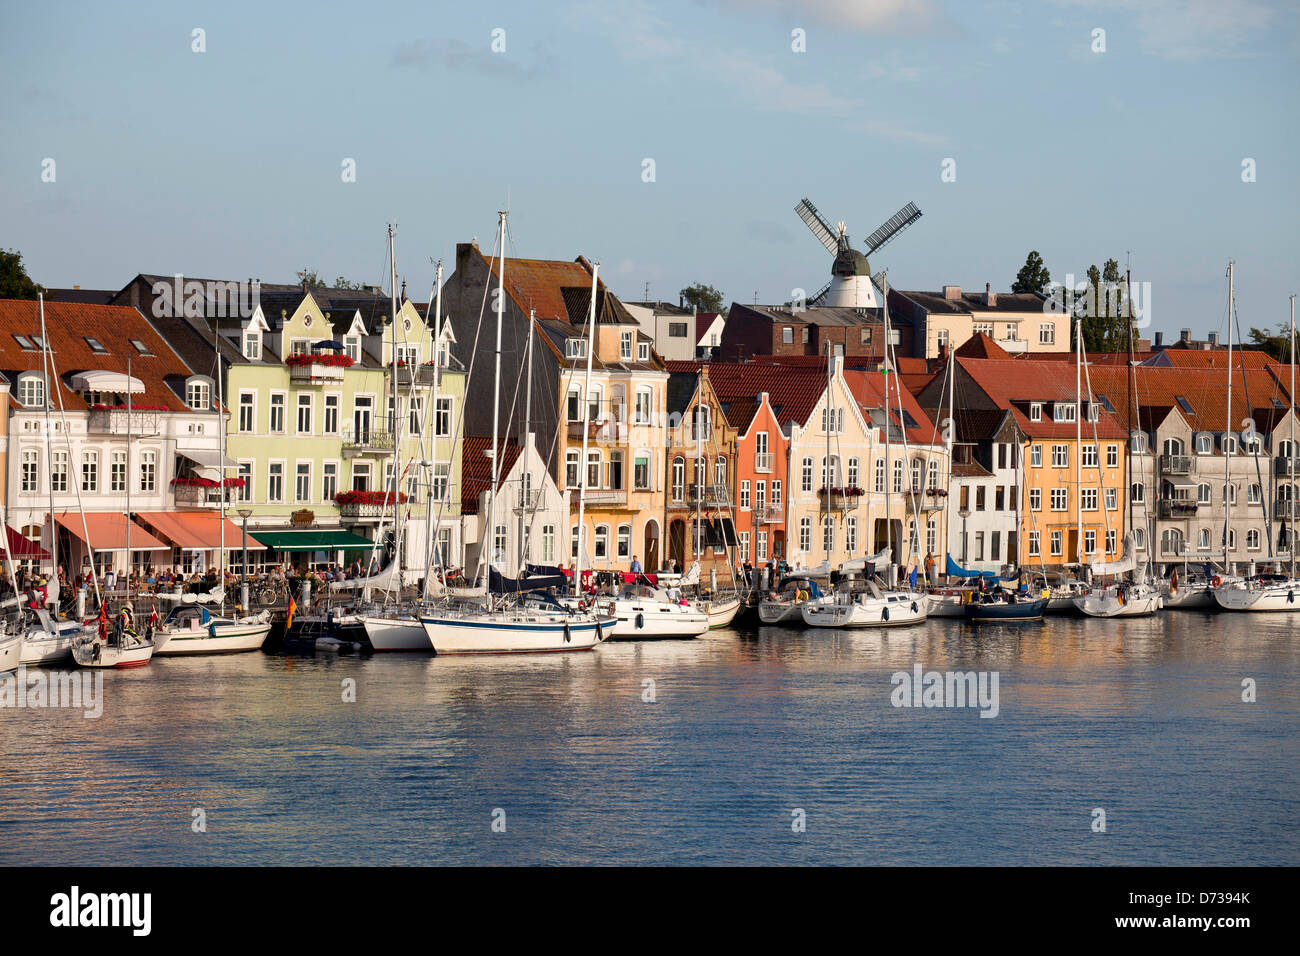 Cityscape, Sonderborg, Denmark, Europe Stock Photo, Royalty Free Image: 56006739 - Alamy